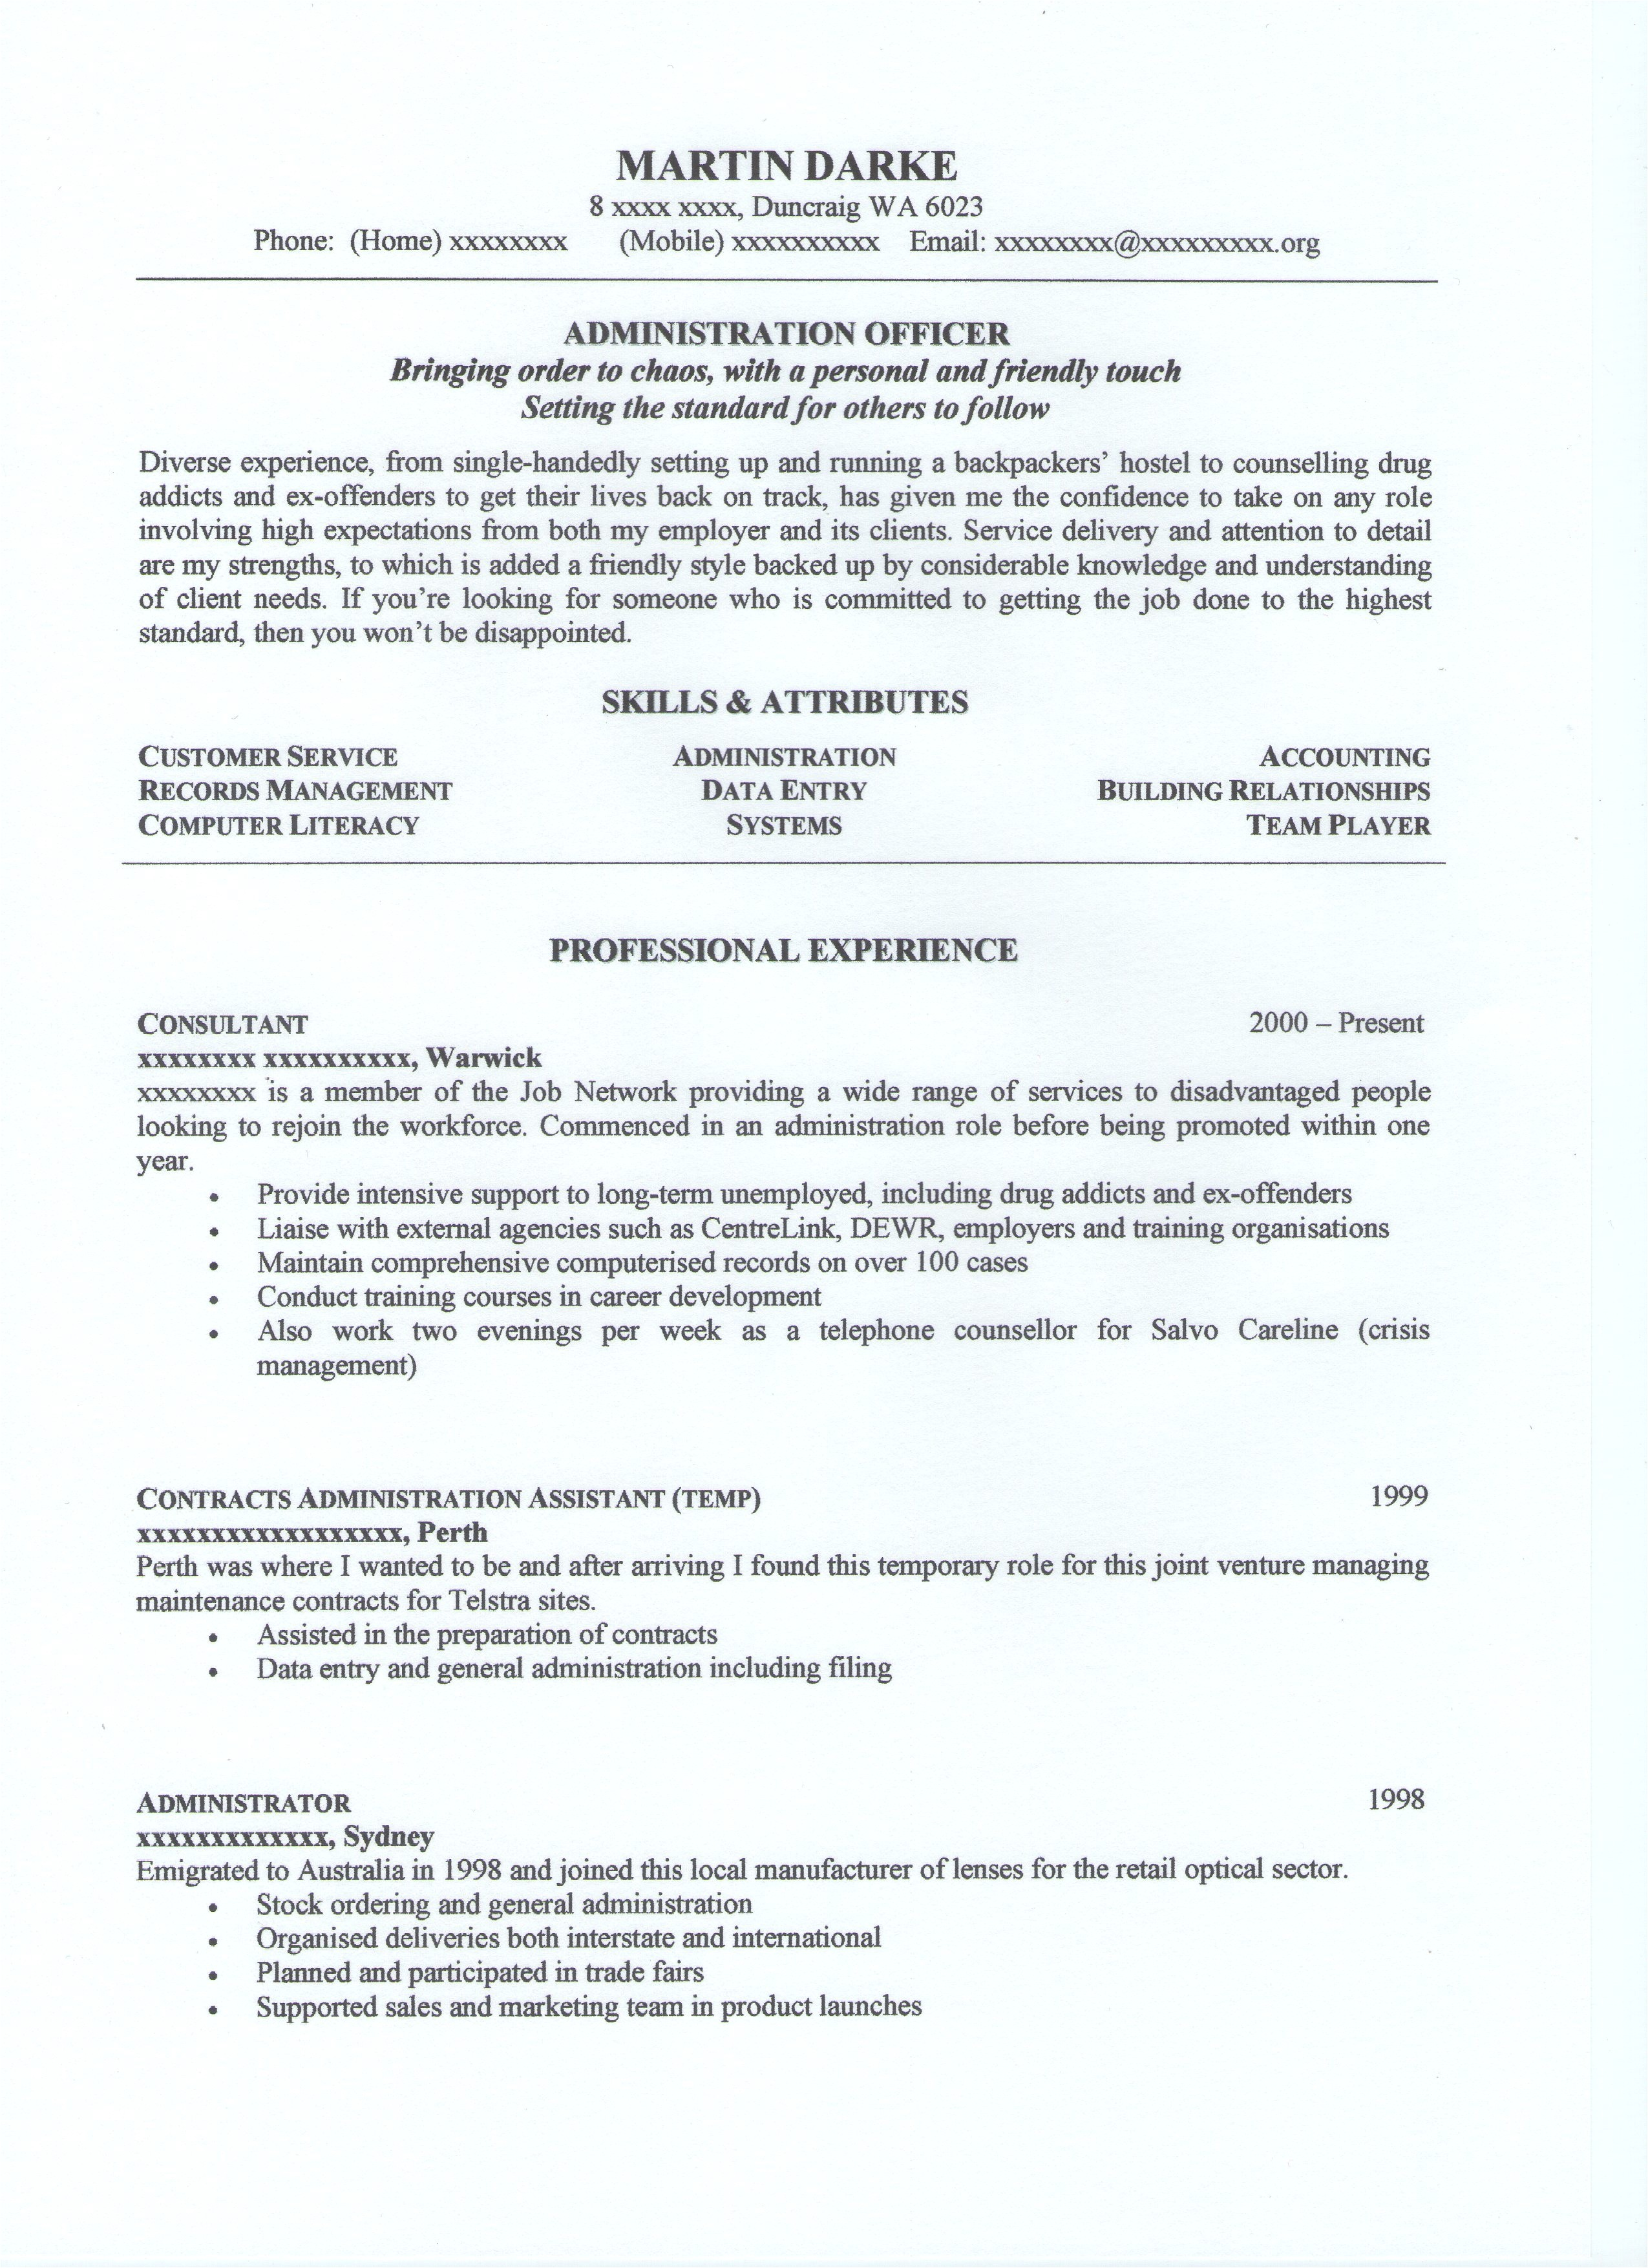 administration resume examples australia